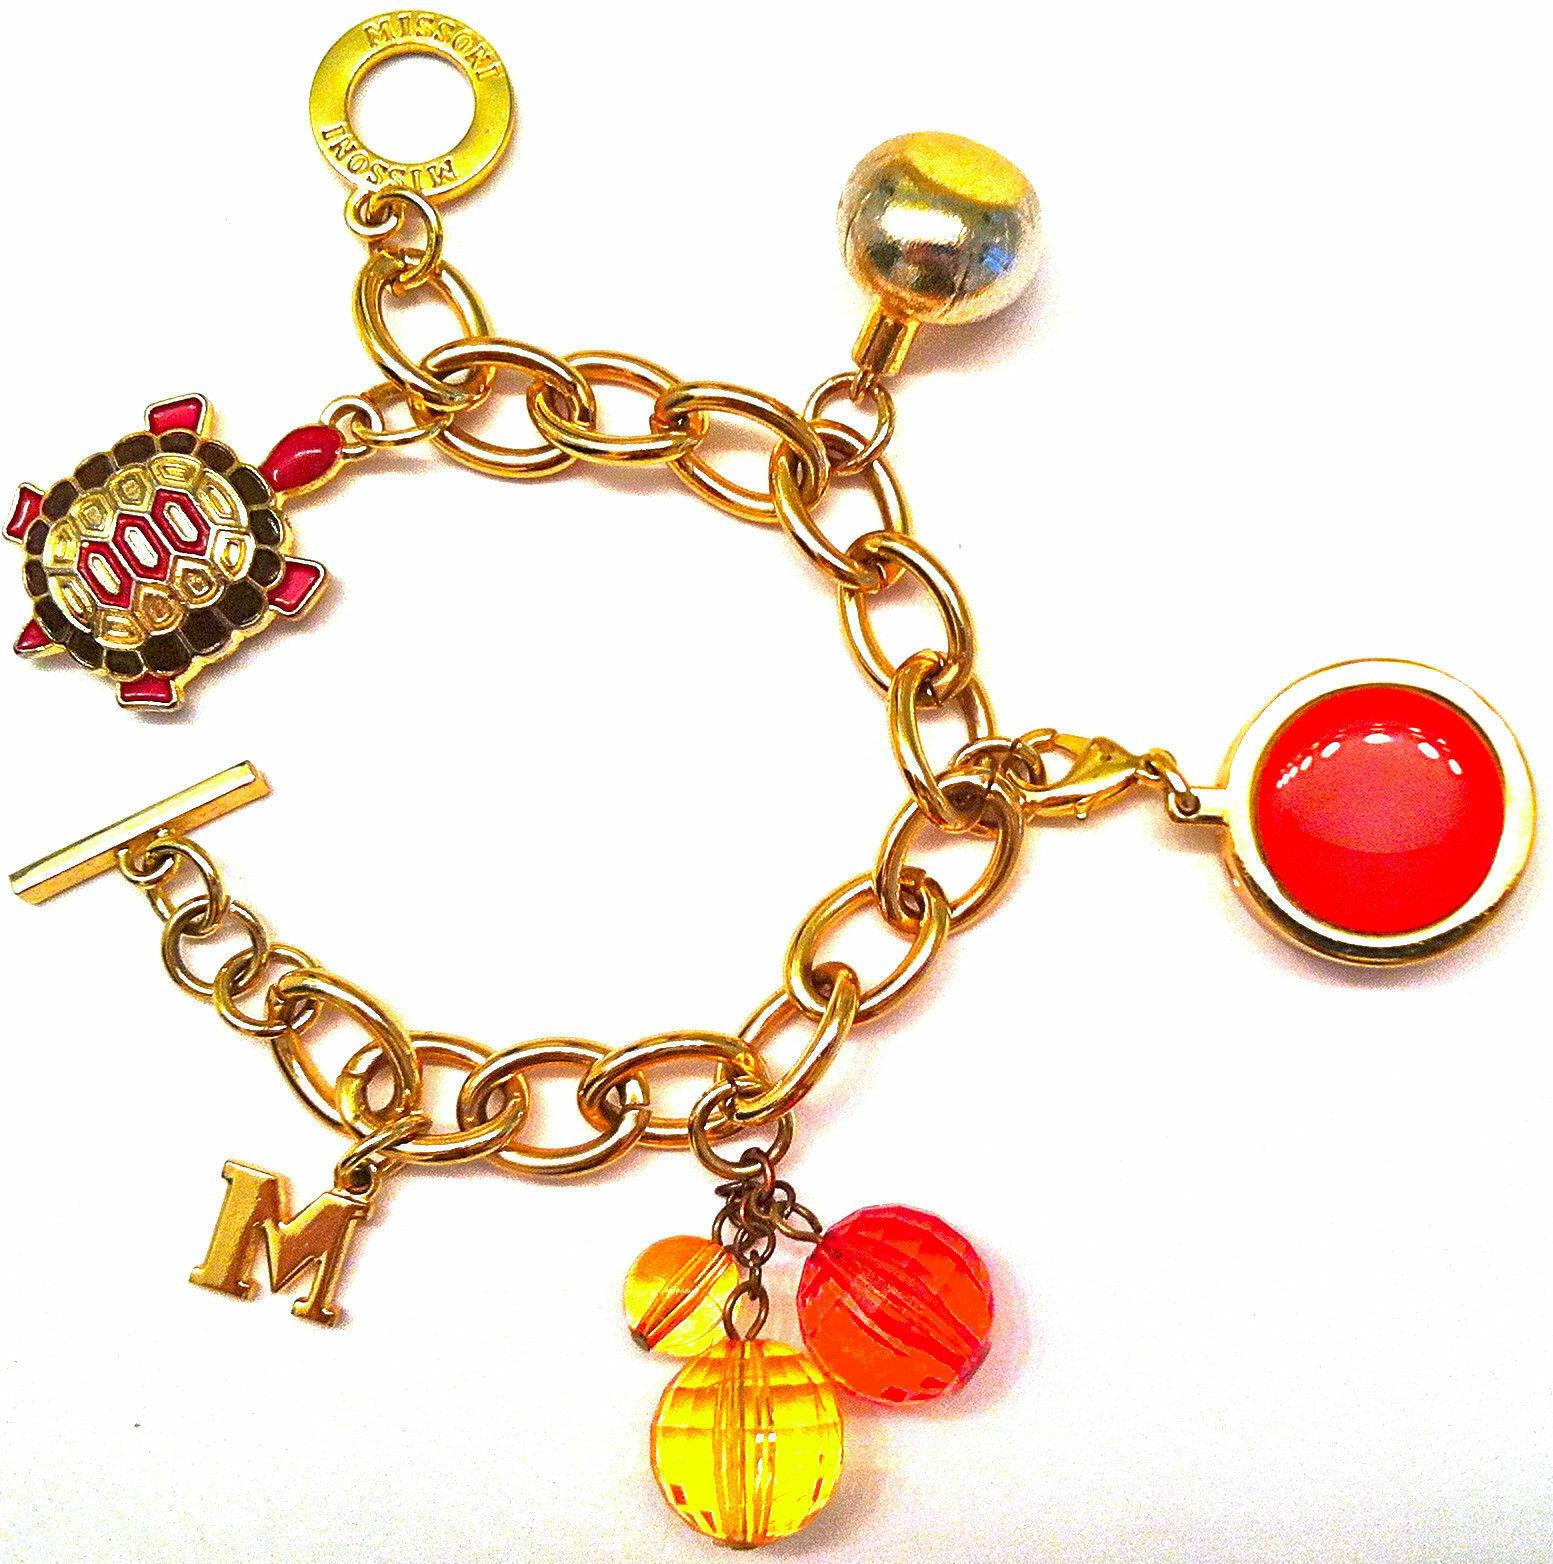 "AUTHENTIC MISSONI JEWELRY PINK TURTLE LOGO GOLD CHARM BRACELET 8"" W/ PERFUME EUC - $79.99"